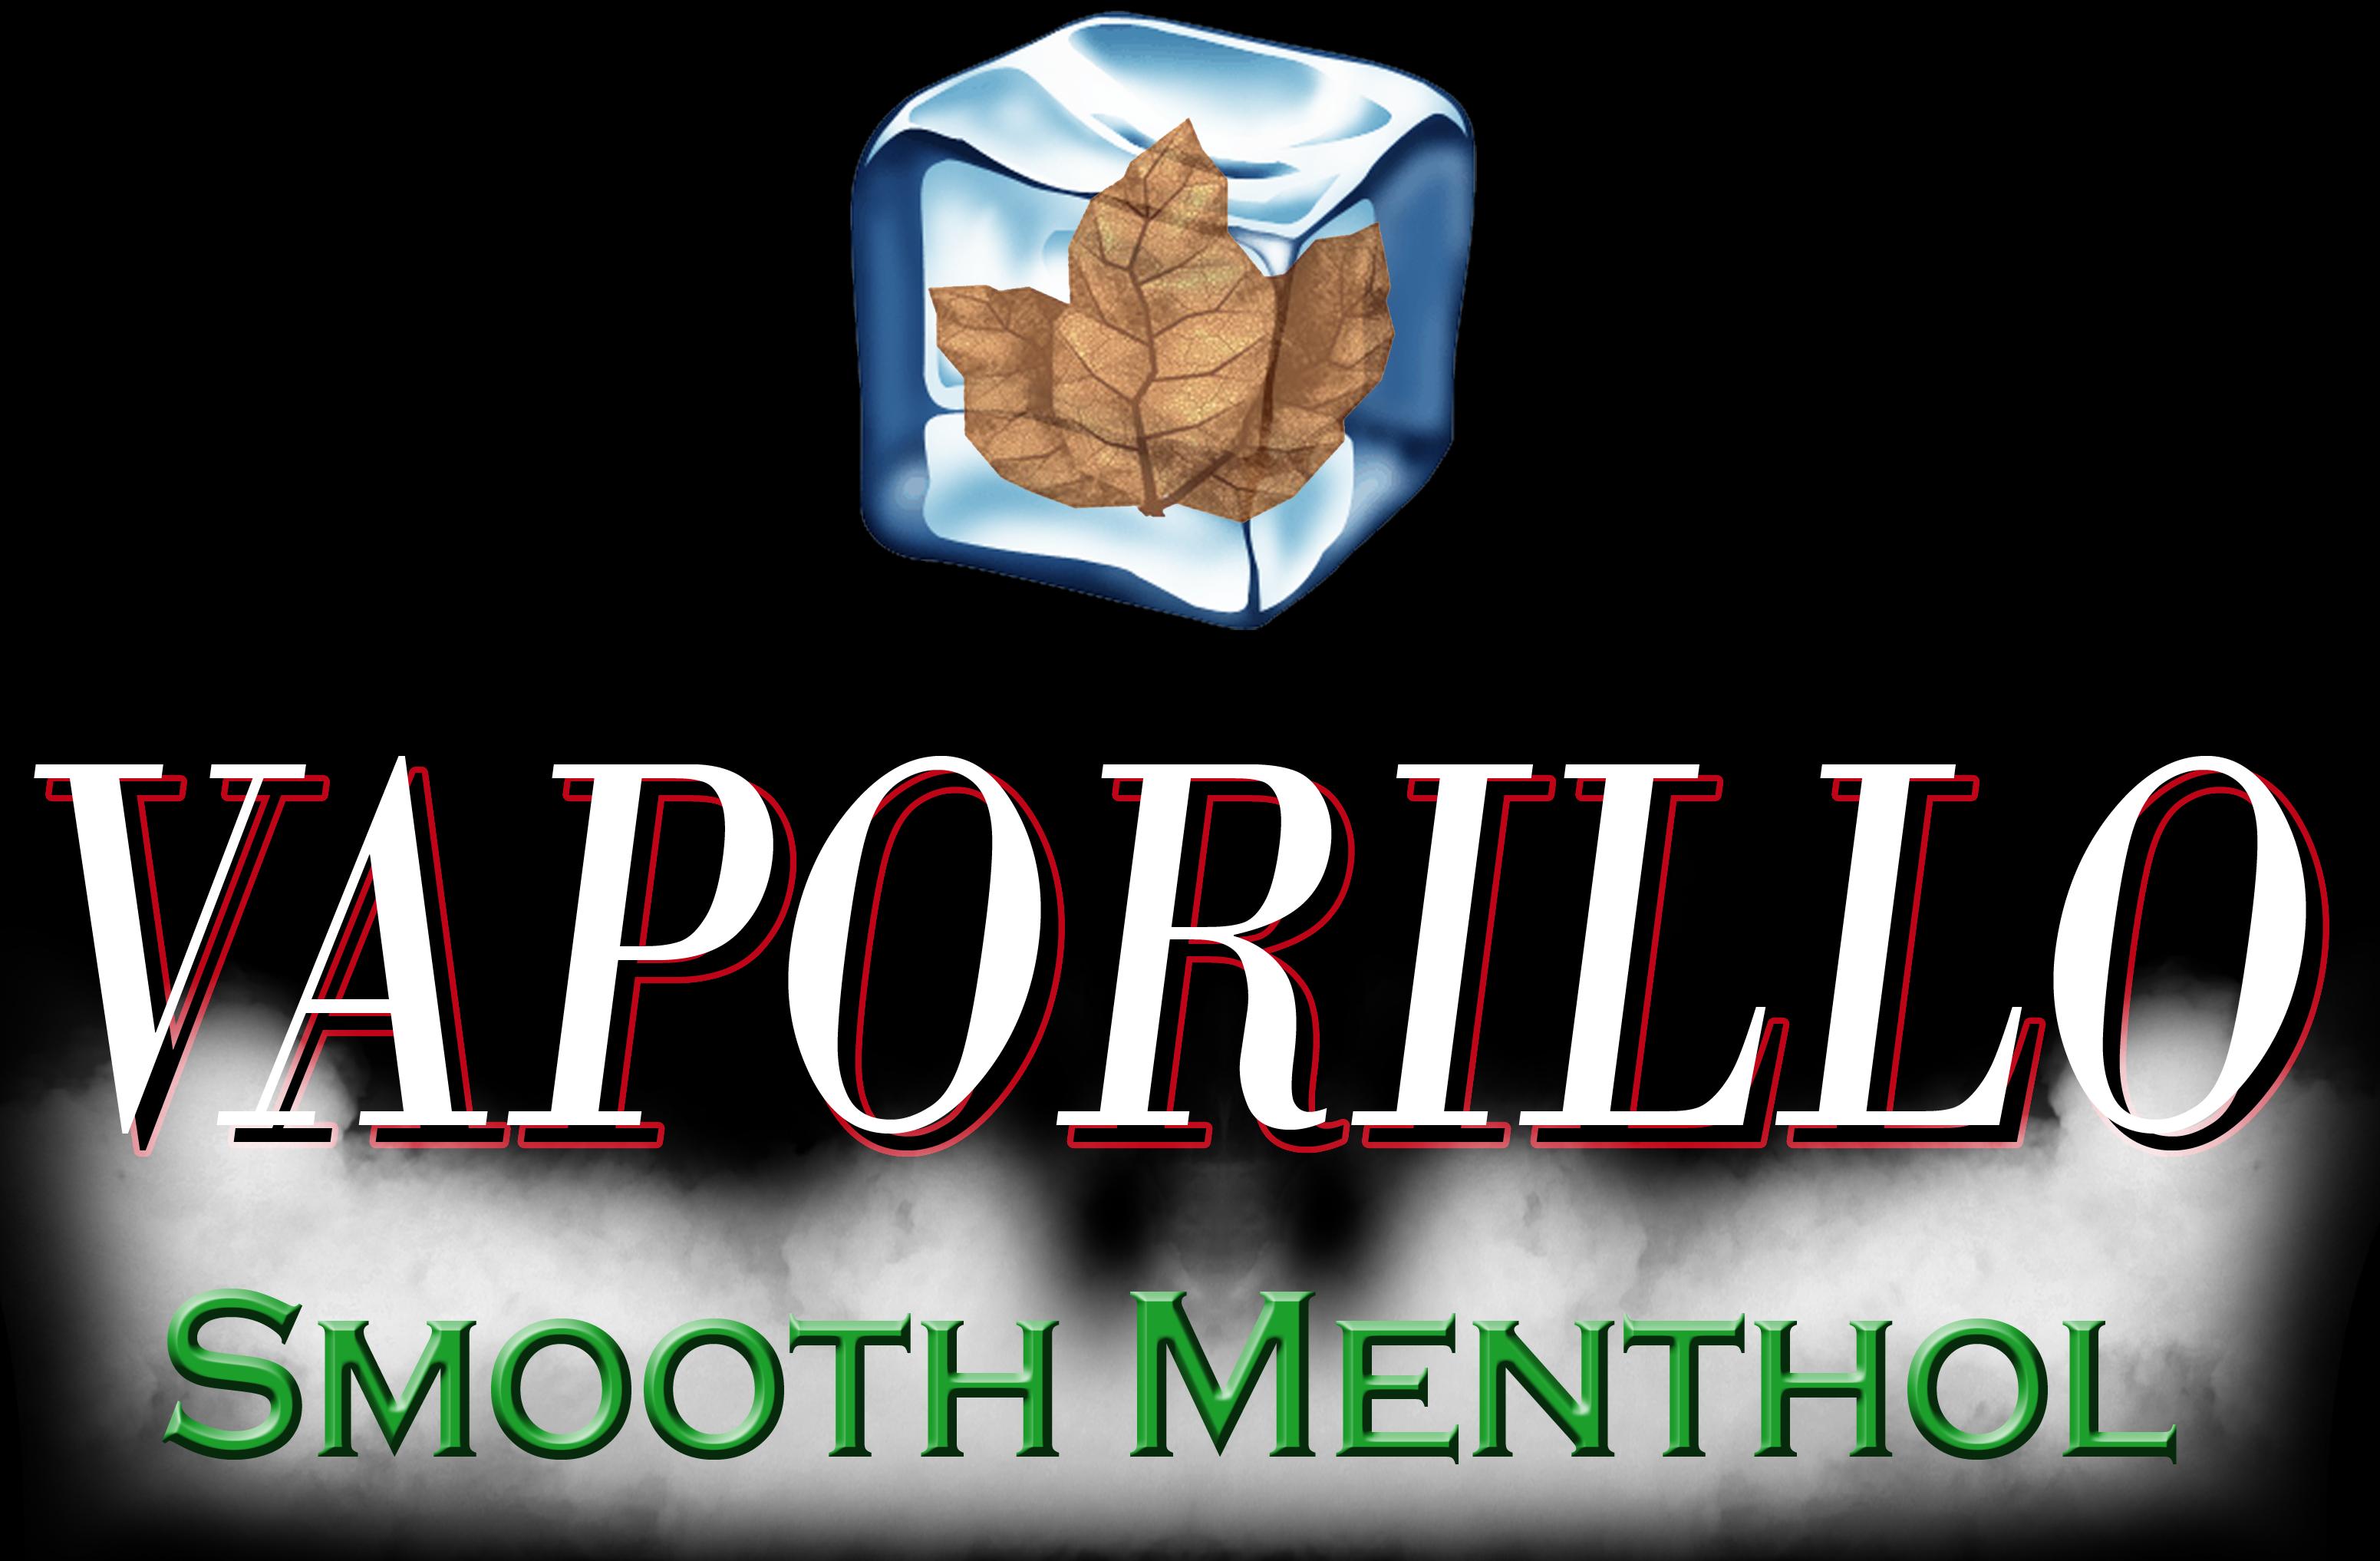 Smooth Menthol